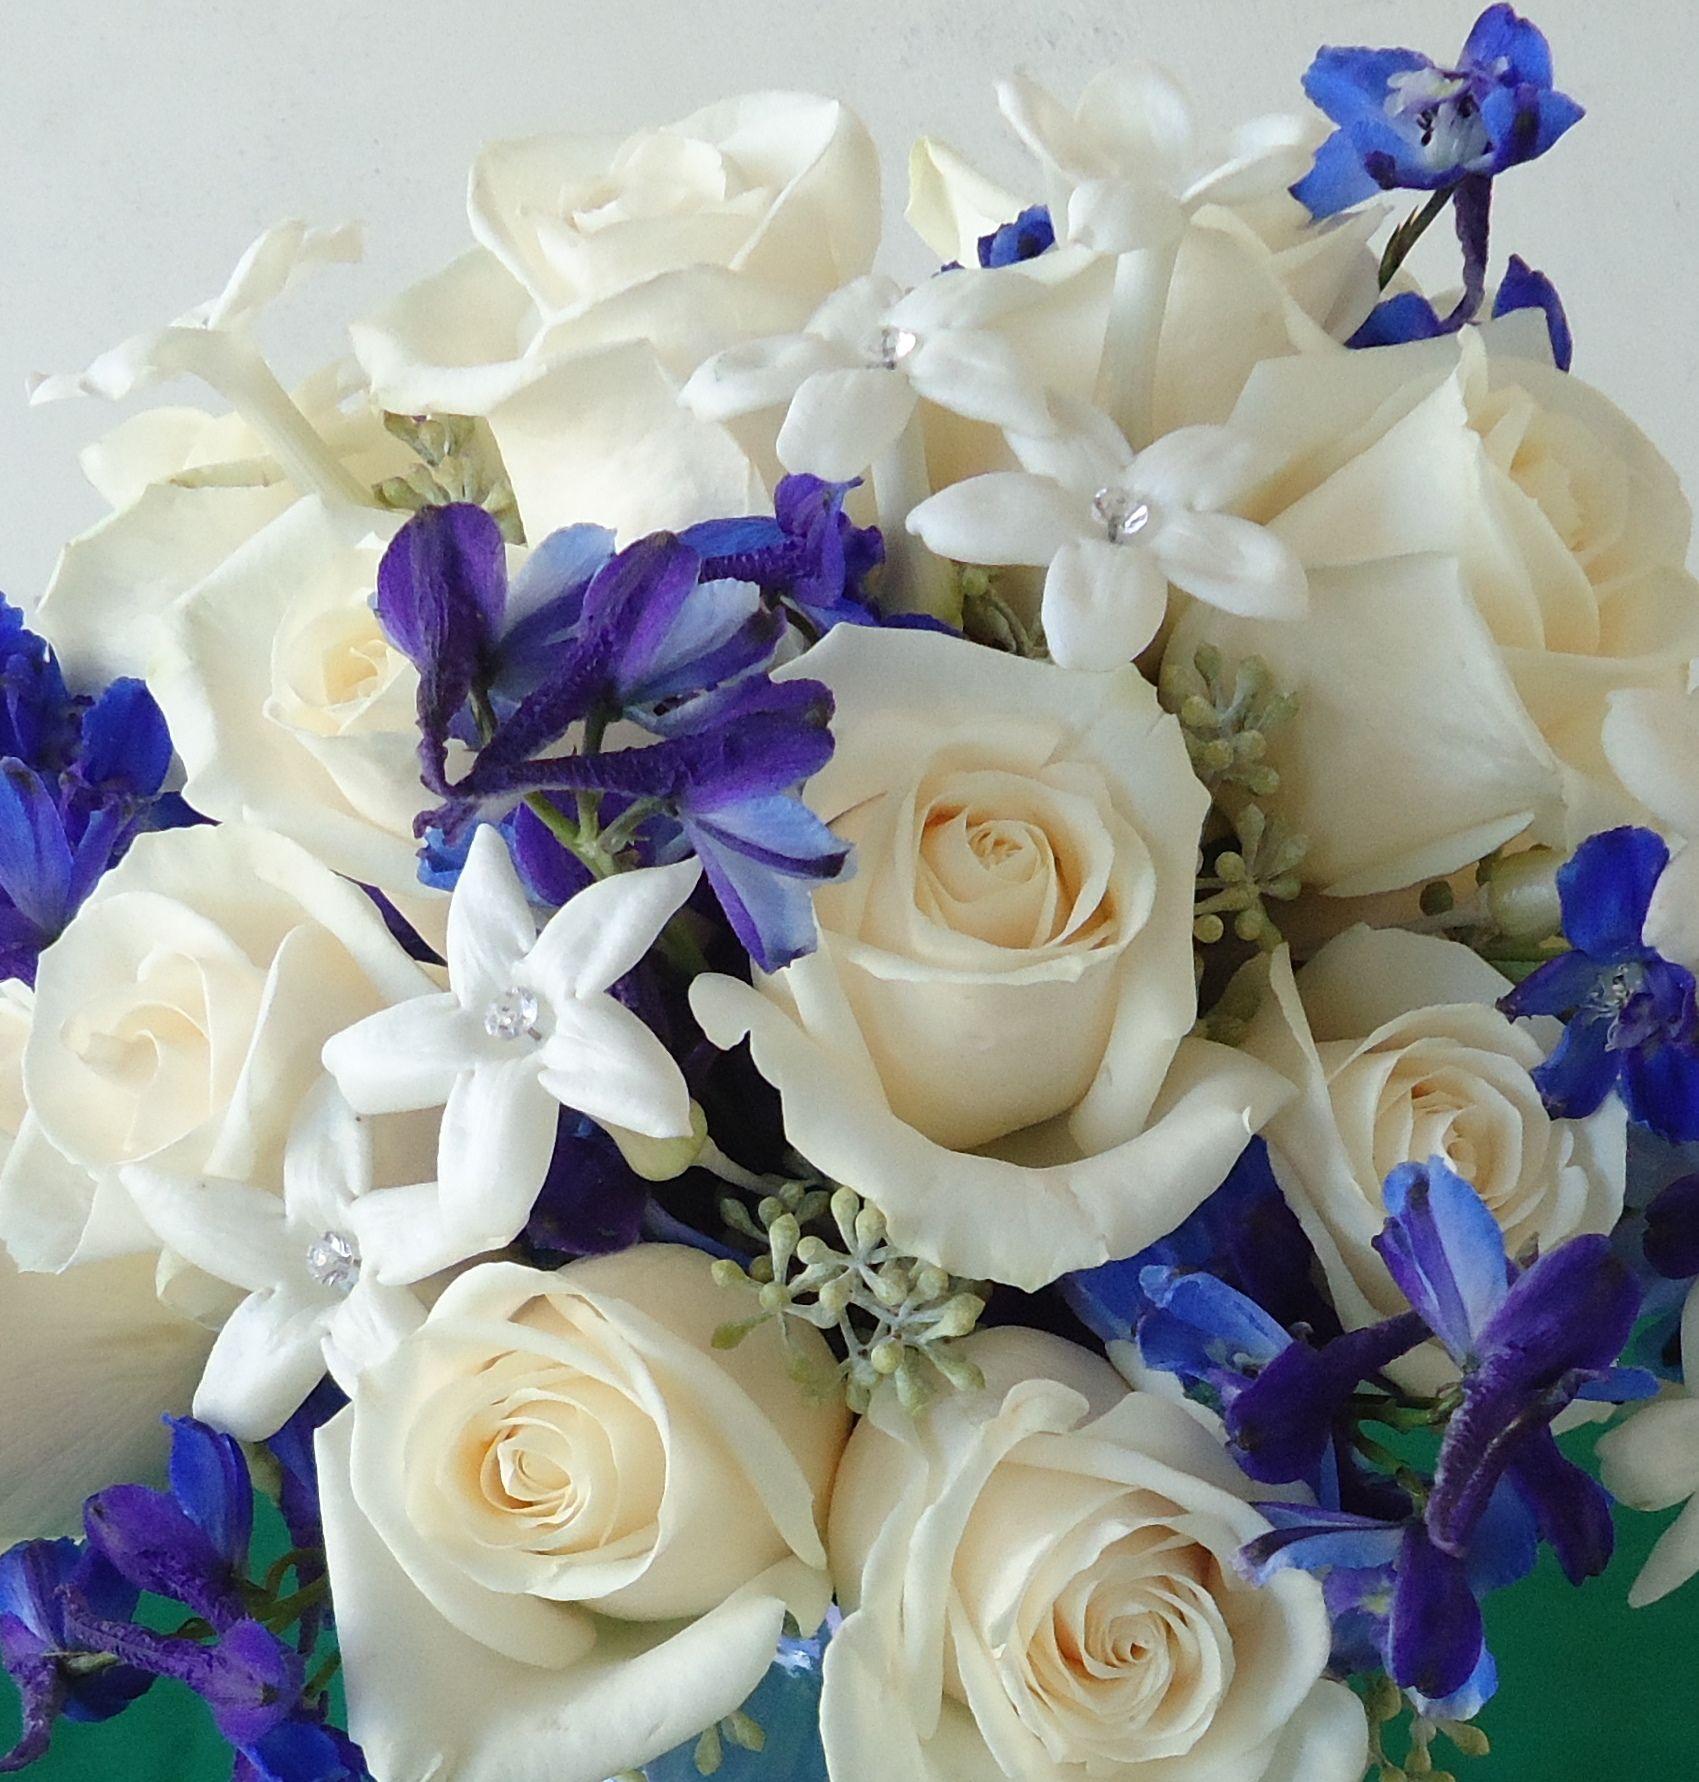 White Roses, White Stephanotis With Dark Blue Delphinium